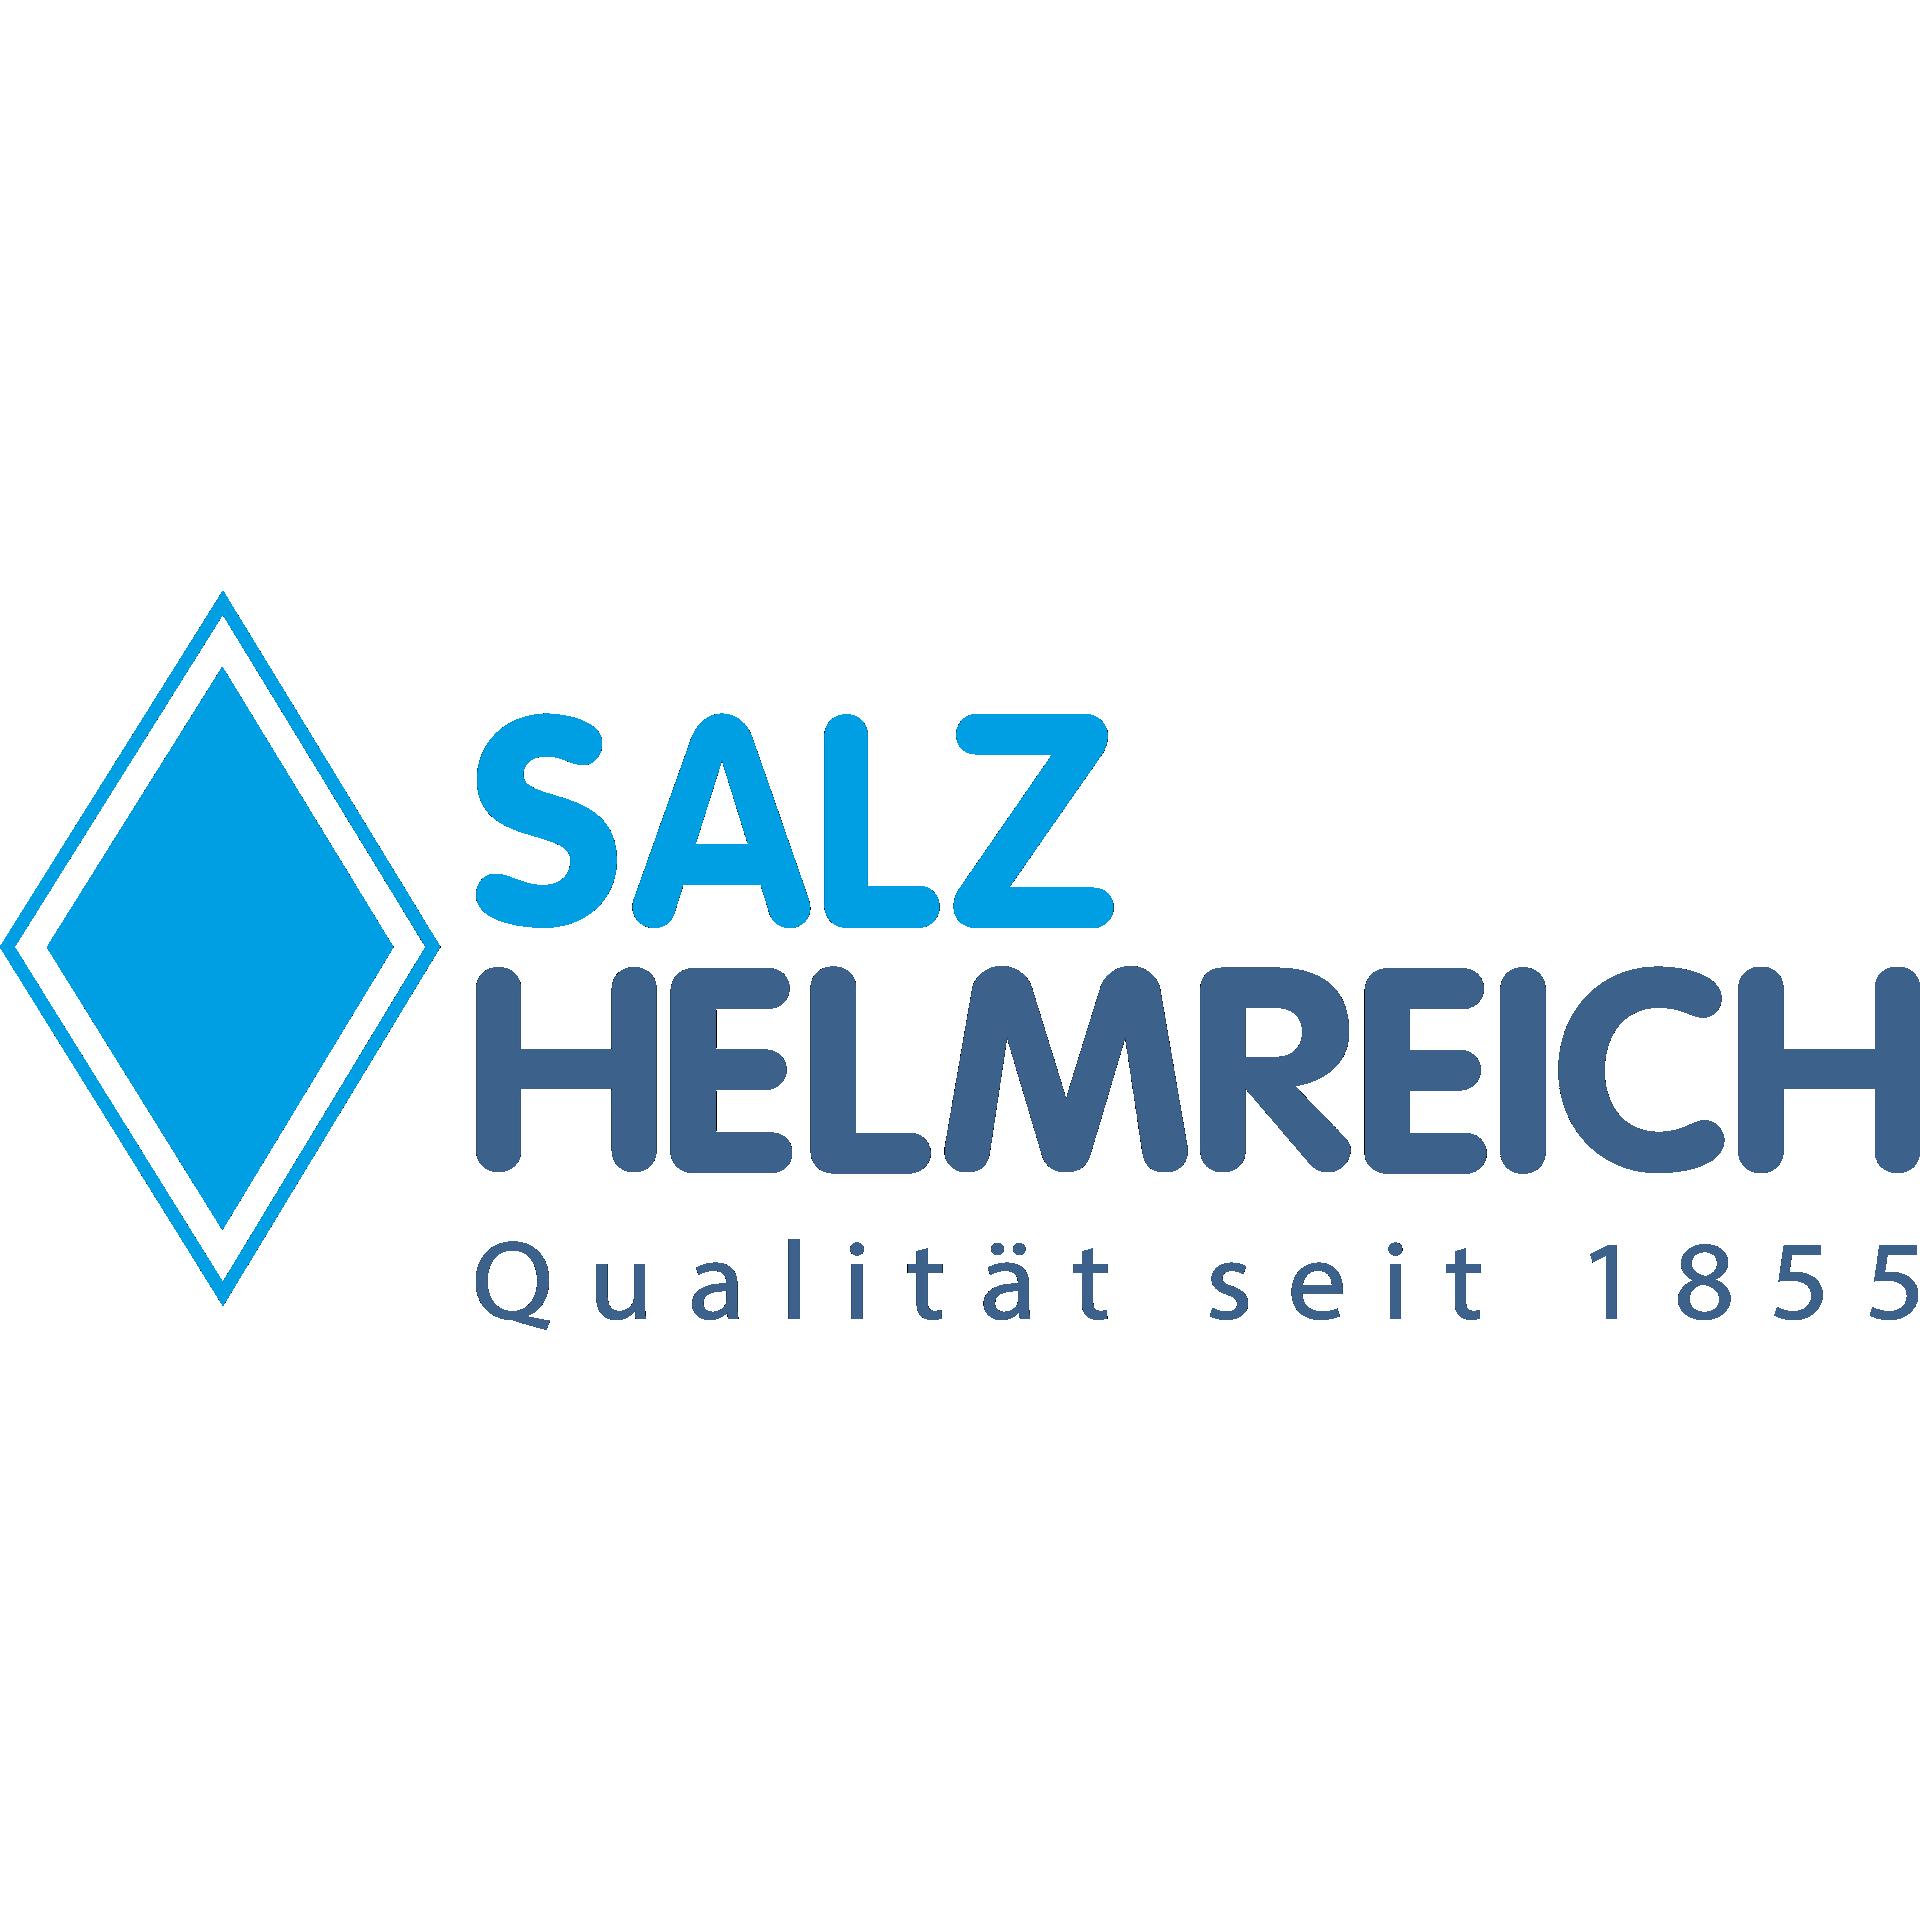 Siede-Speisesalz Calibrated 0,13-0,4 mm im 25 kg Sack